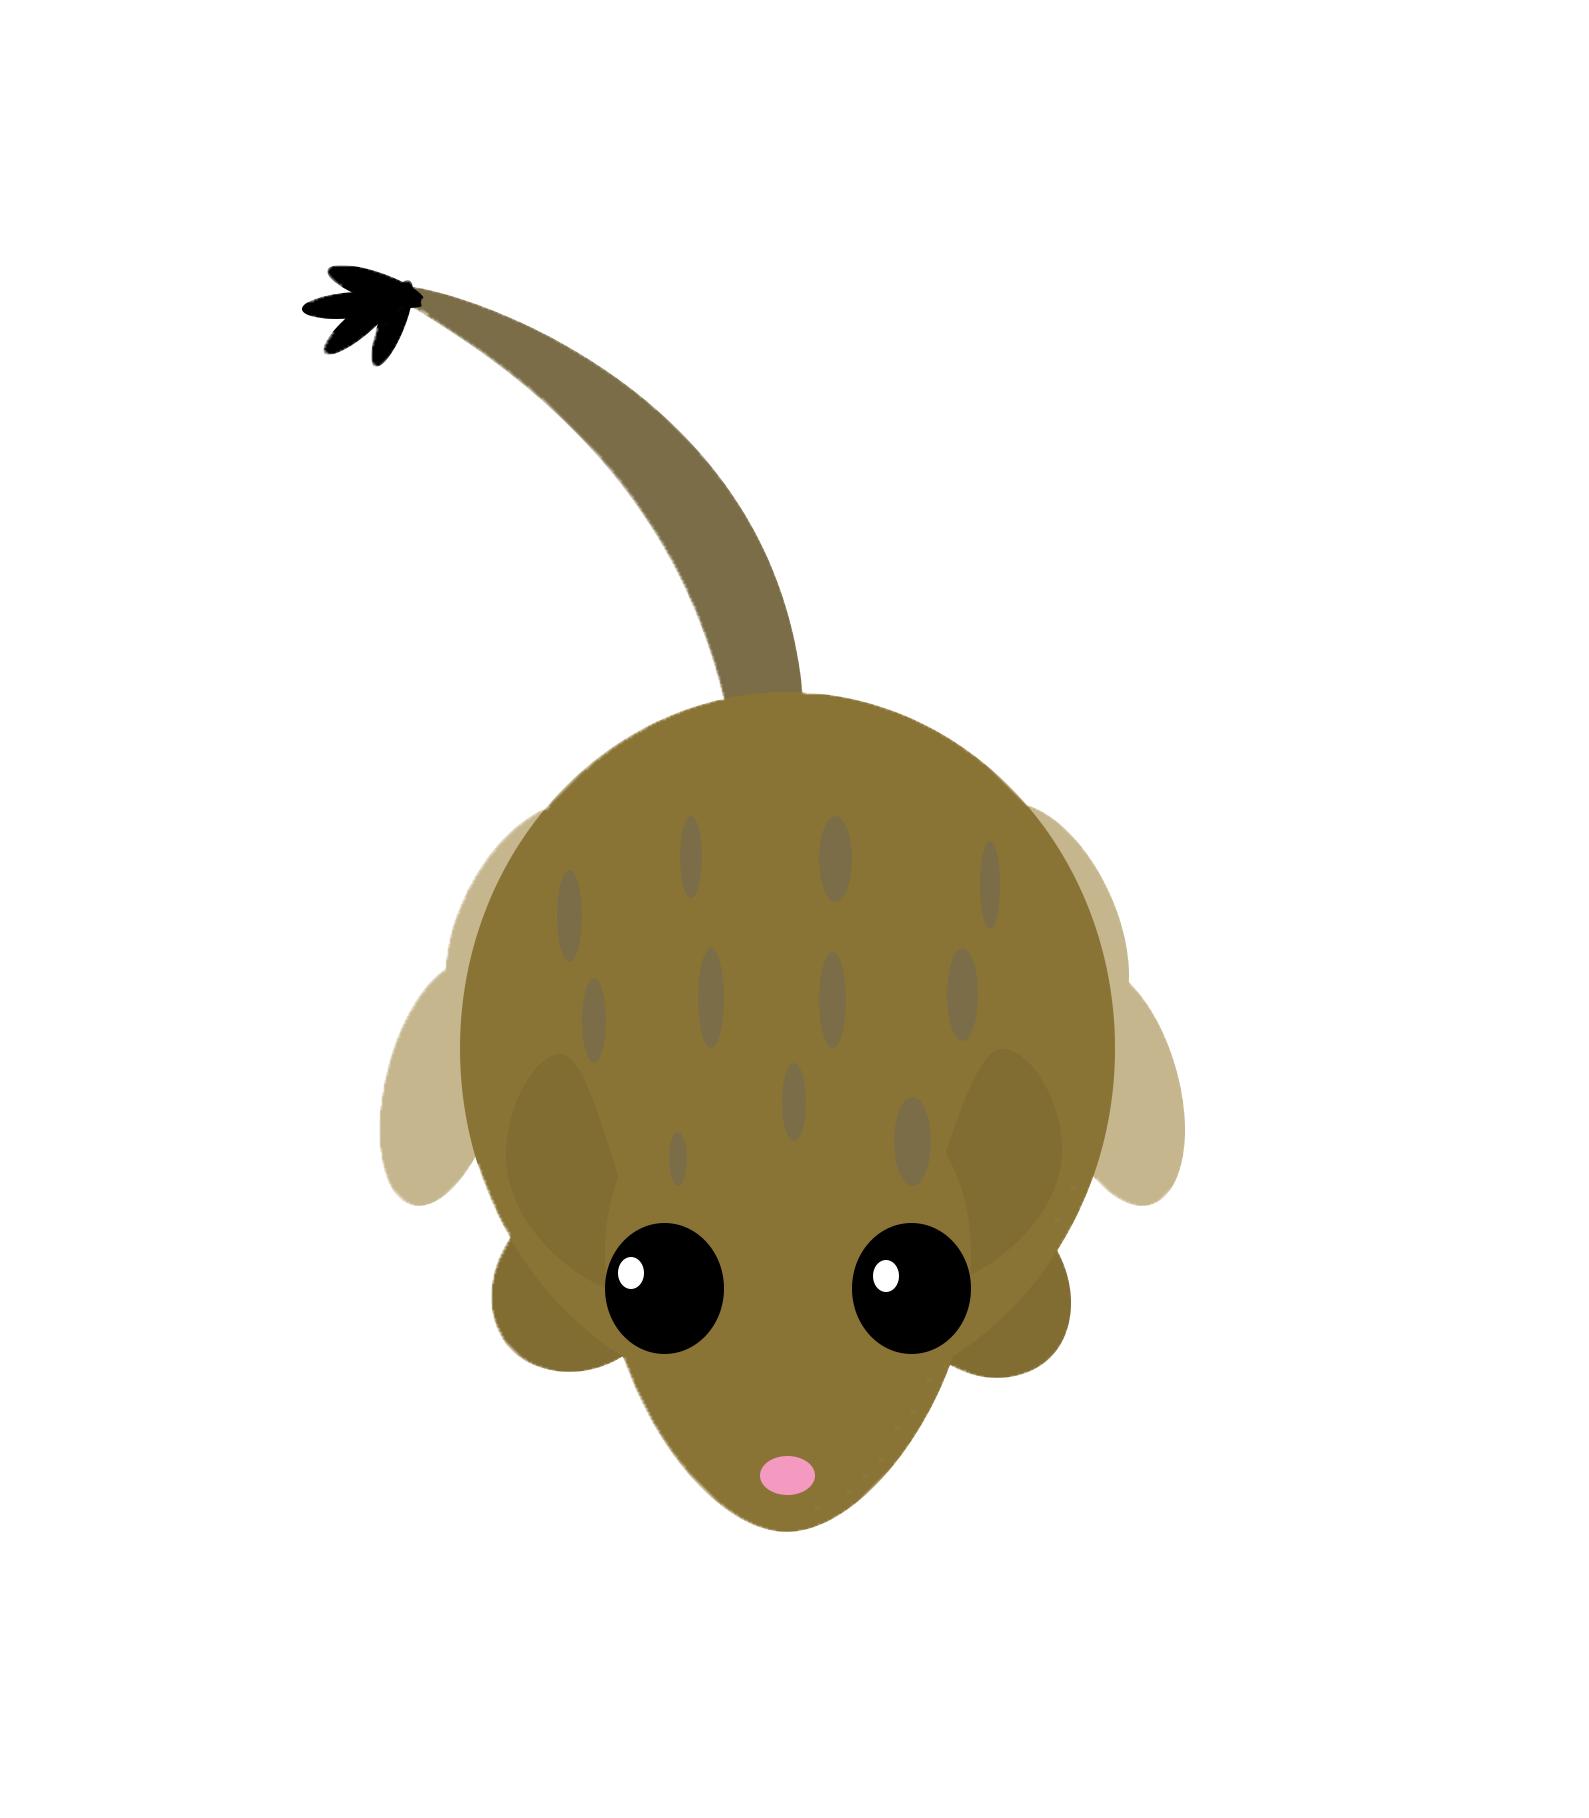 Contest mopeio welcome to. Clipart rat kangaroo rat